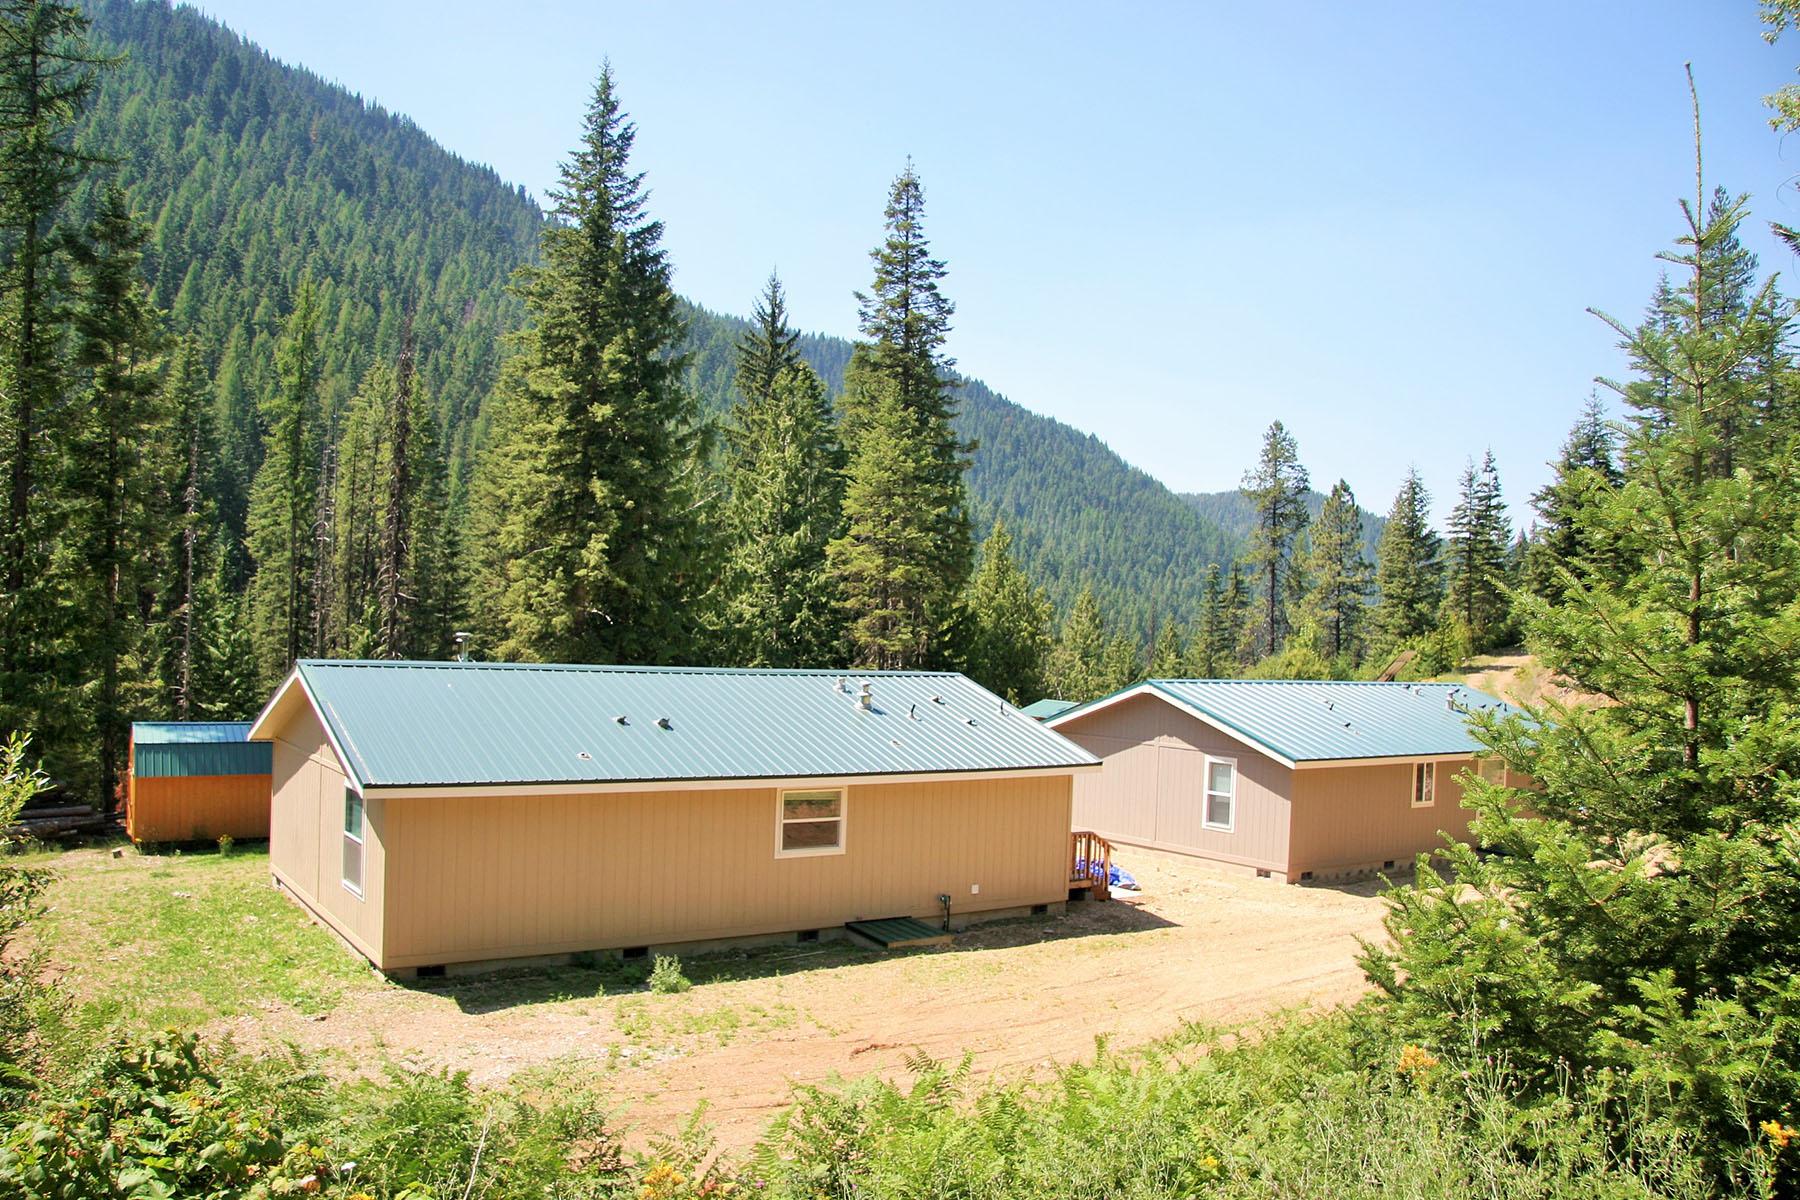 獨棟家庭住宅 為 出售 在 Truly one of a kind 50 acre homestead! 7000 Moon Pass Rd Wallace, 愛達荷州, 83873 美國